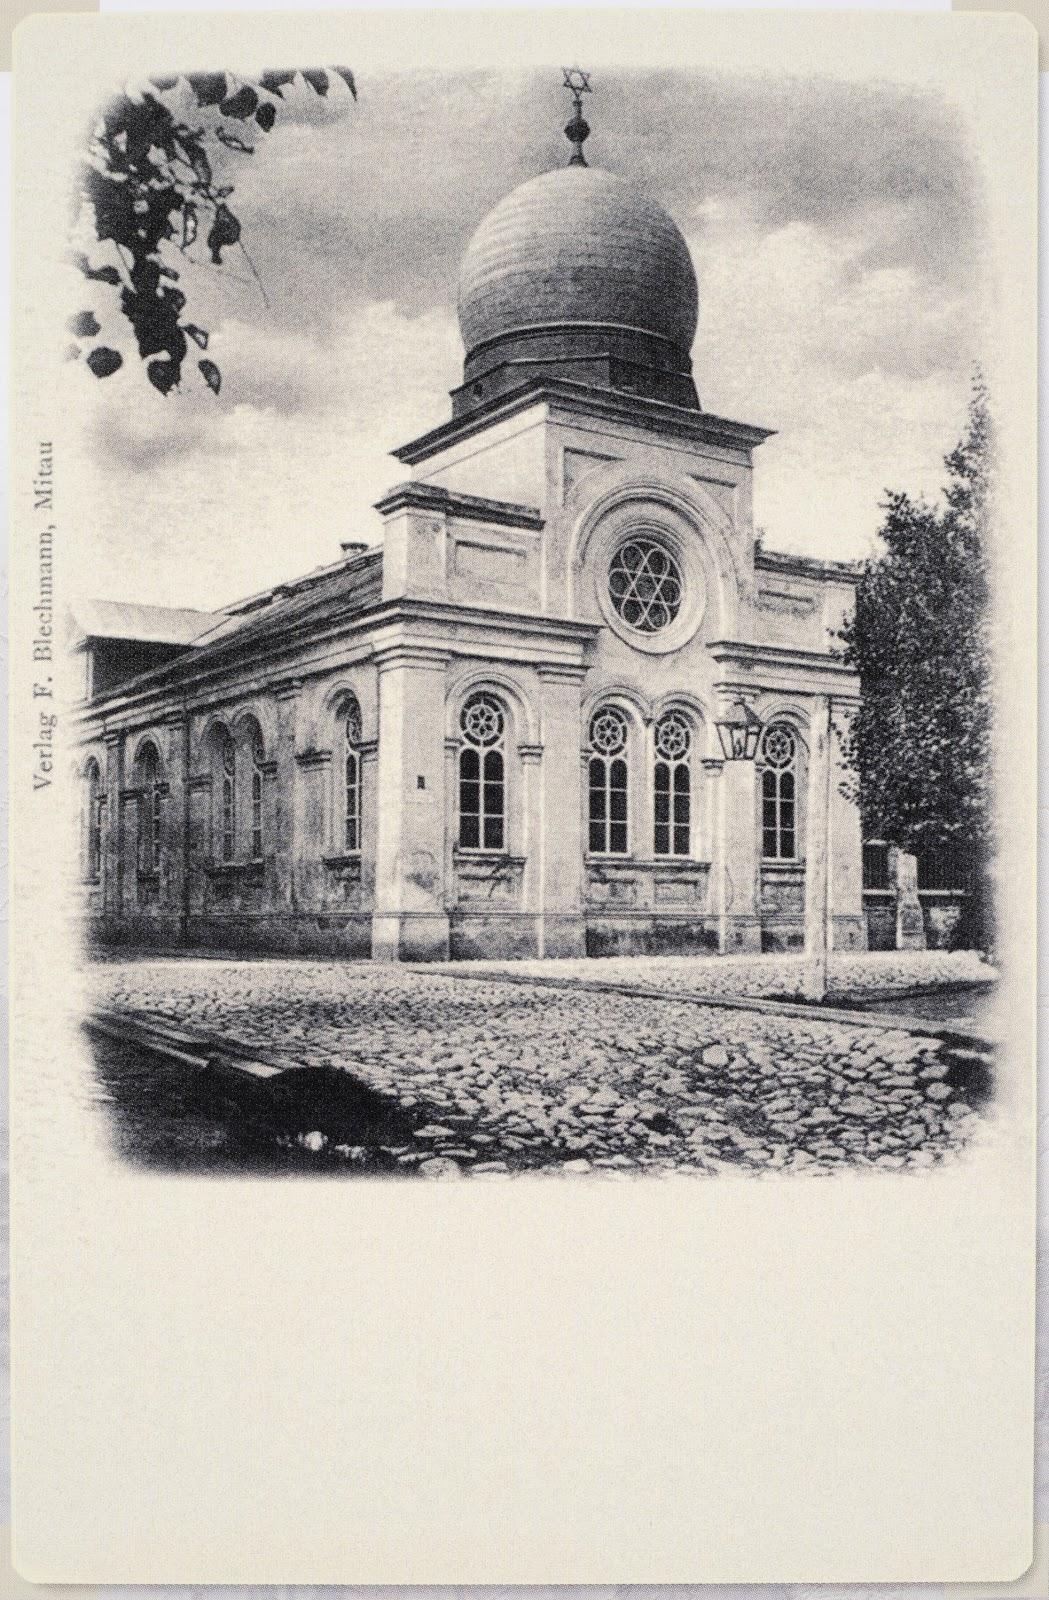 http://3.bp.blogspot.com/-mCBMUAcK9aI/T0cAqGkC5eI/AAAAAAAAWKA/KSQX-FlWwDI/s1600/Jelgava_(Mitava)_Latvia_Great_Synagogue_postcard_late_19th_cent_frm_V_Likhodedov_Synagogues_p210%2B(2).JPG